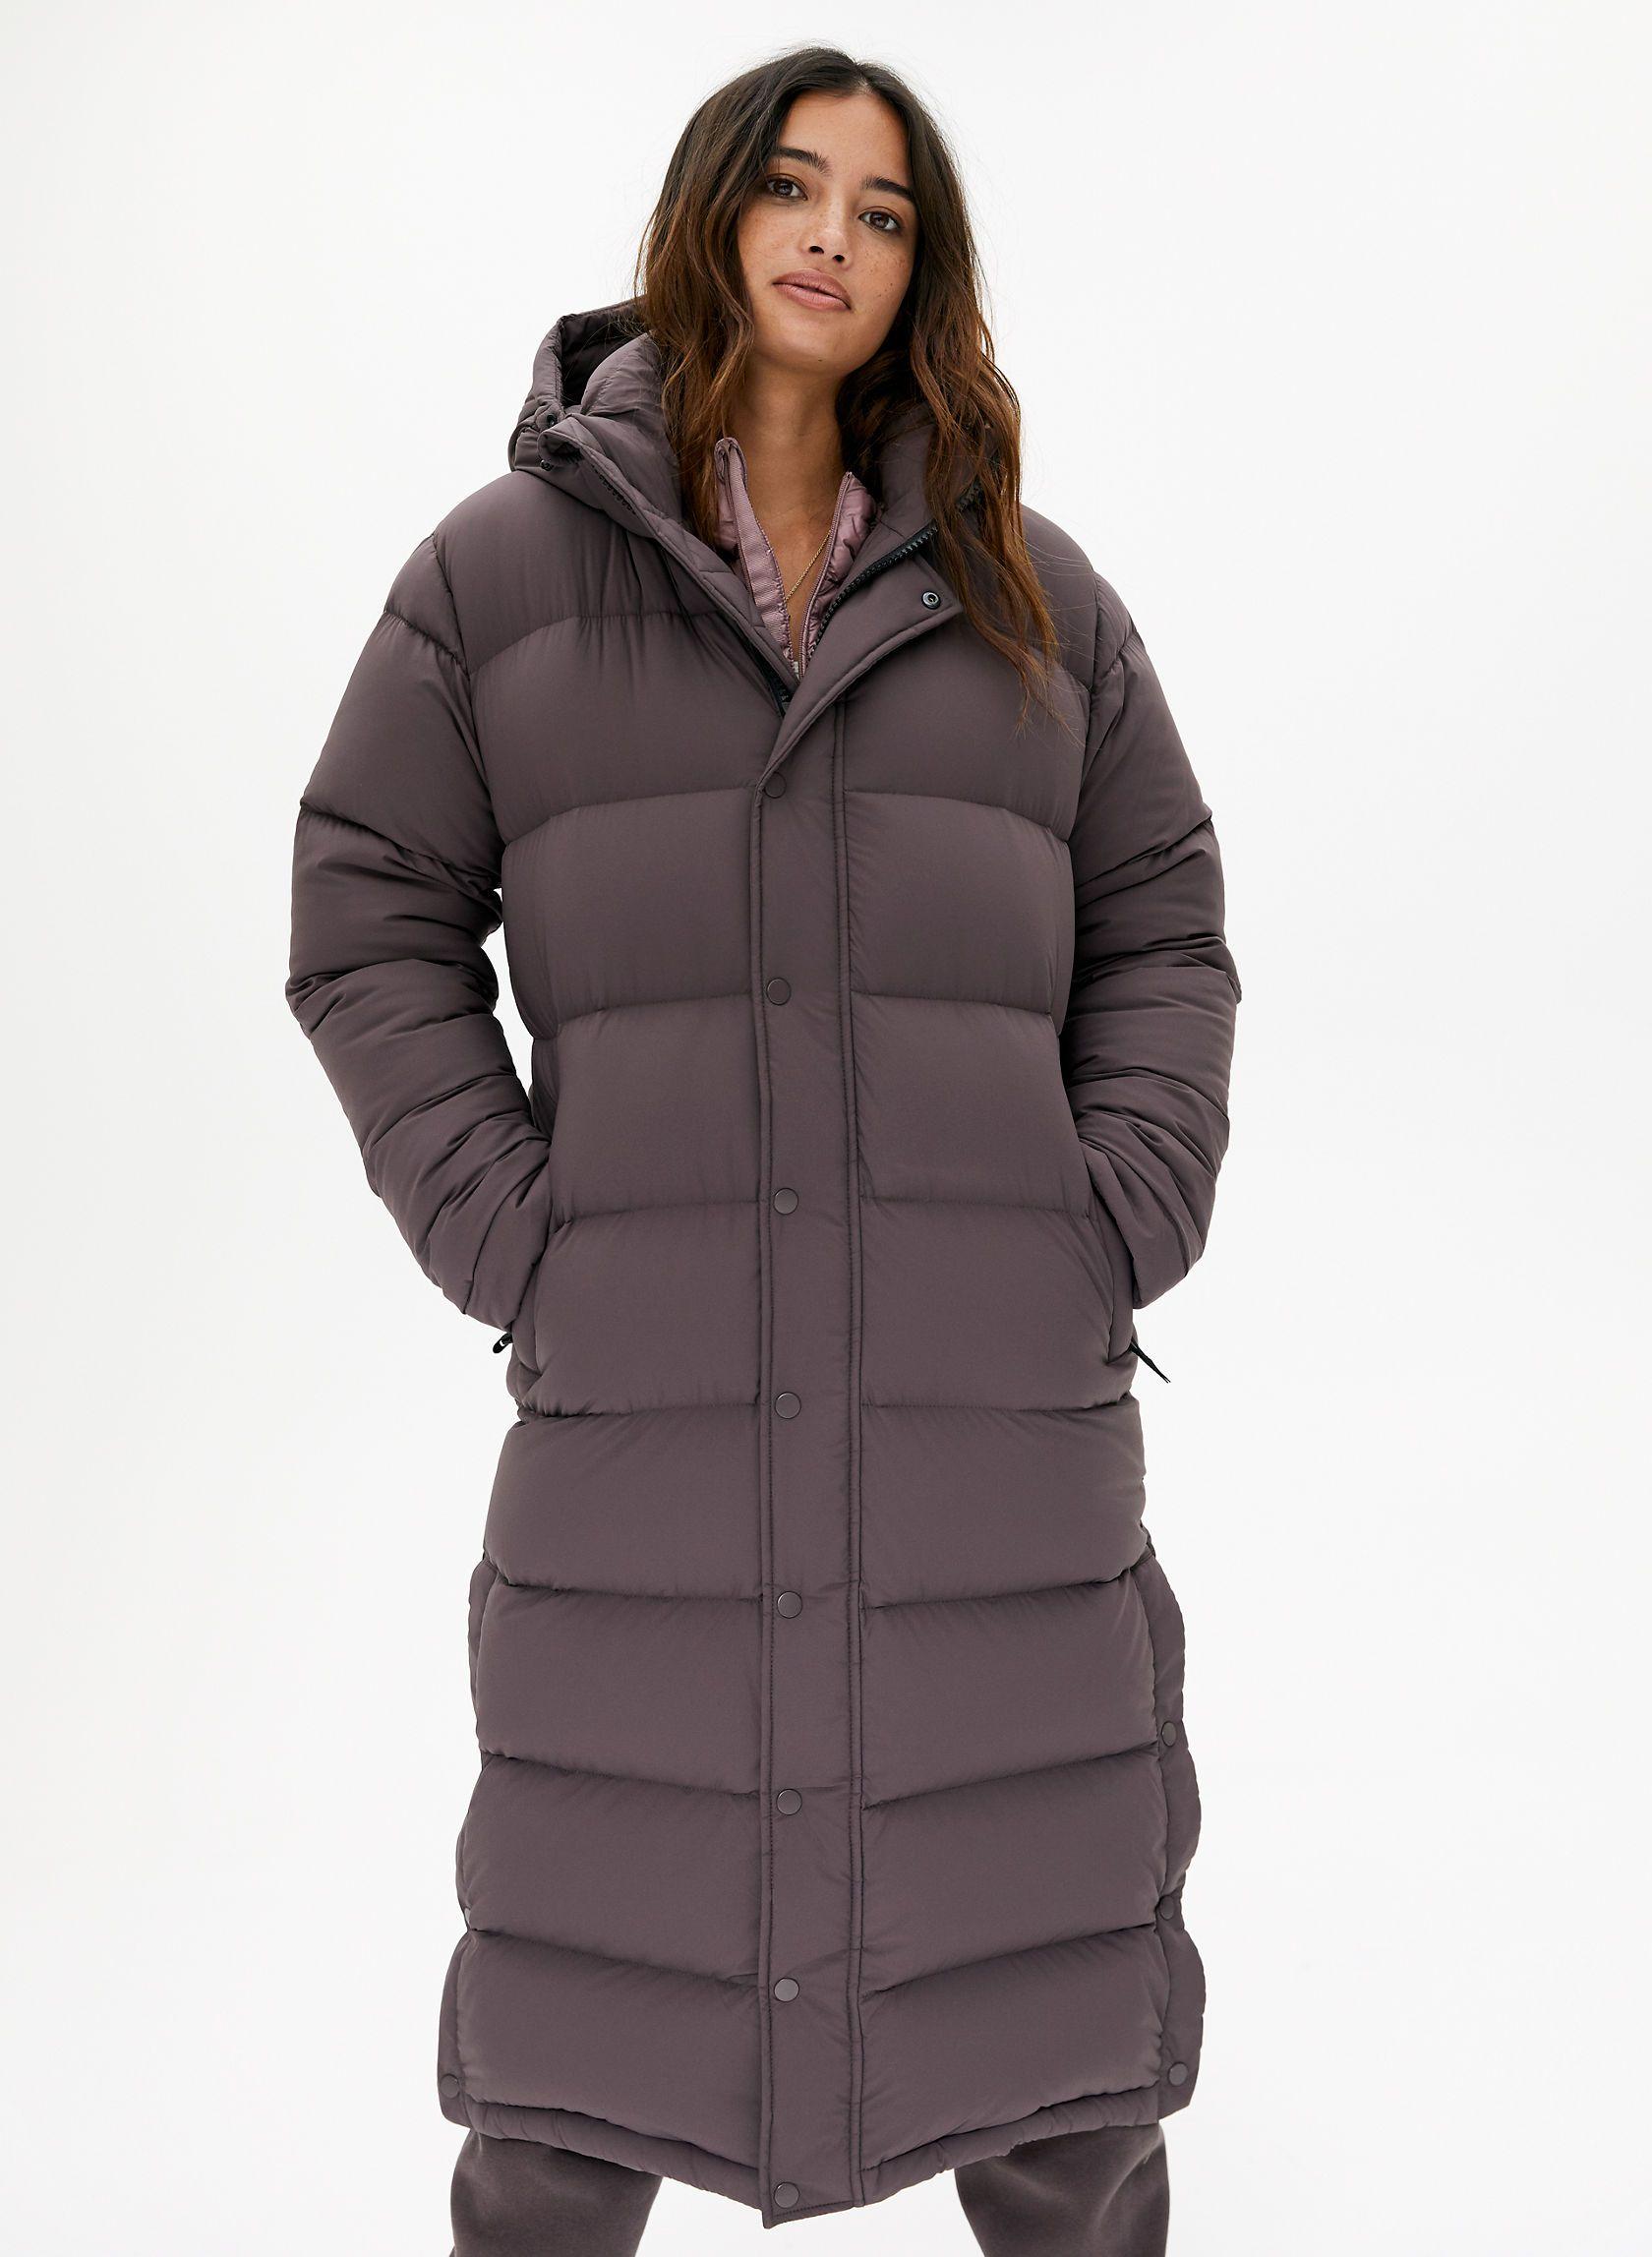 The Super Puff Long Puffer Jacket Style Winter Coat Parka Long Puffer [ 2295 x 1680 Pixel ]